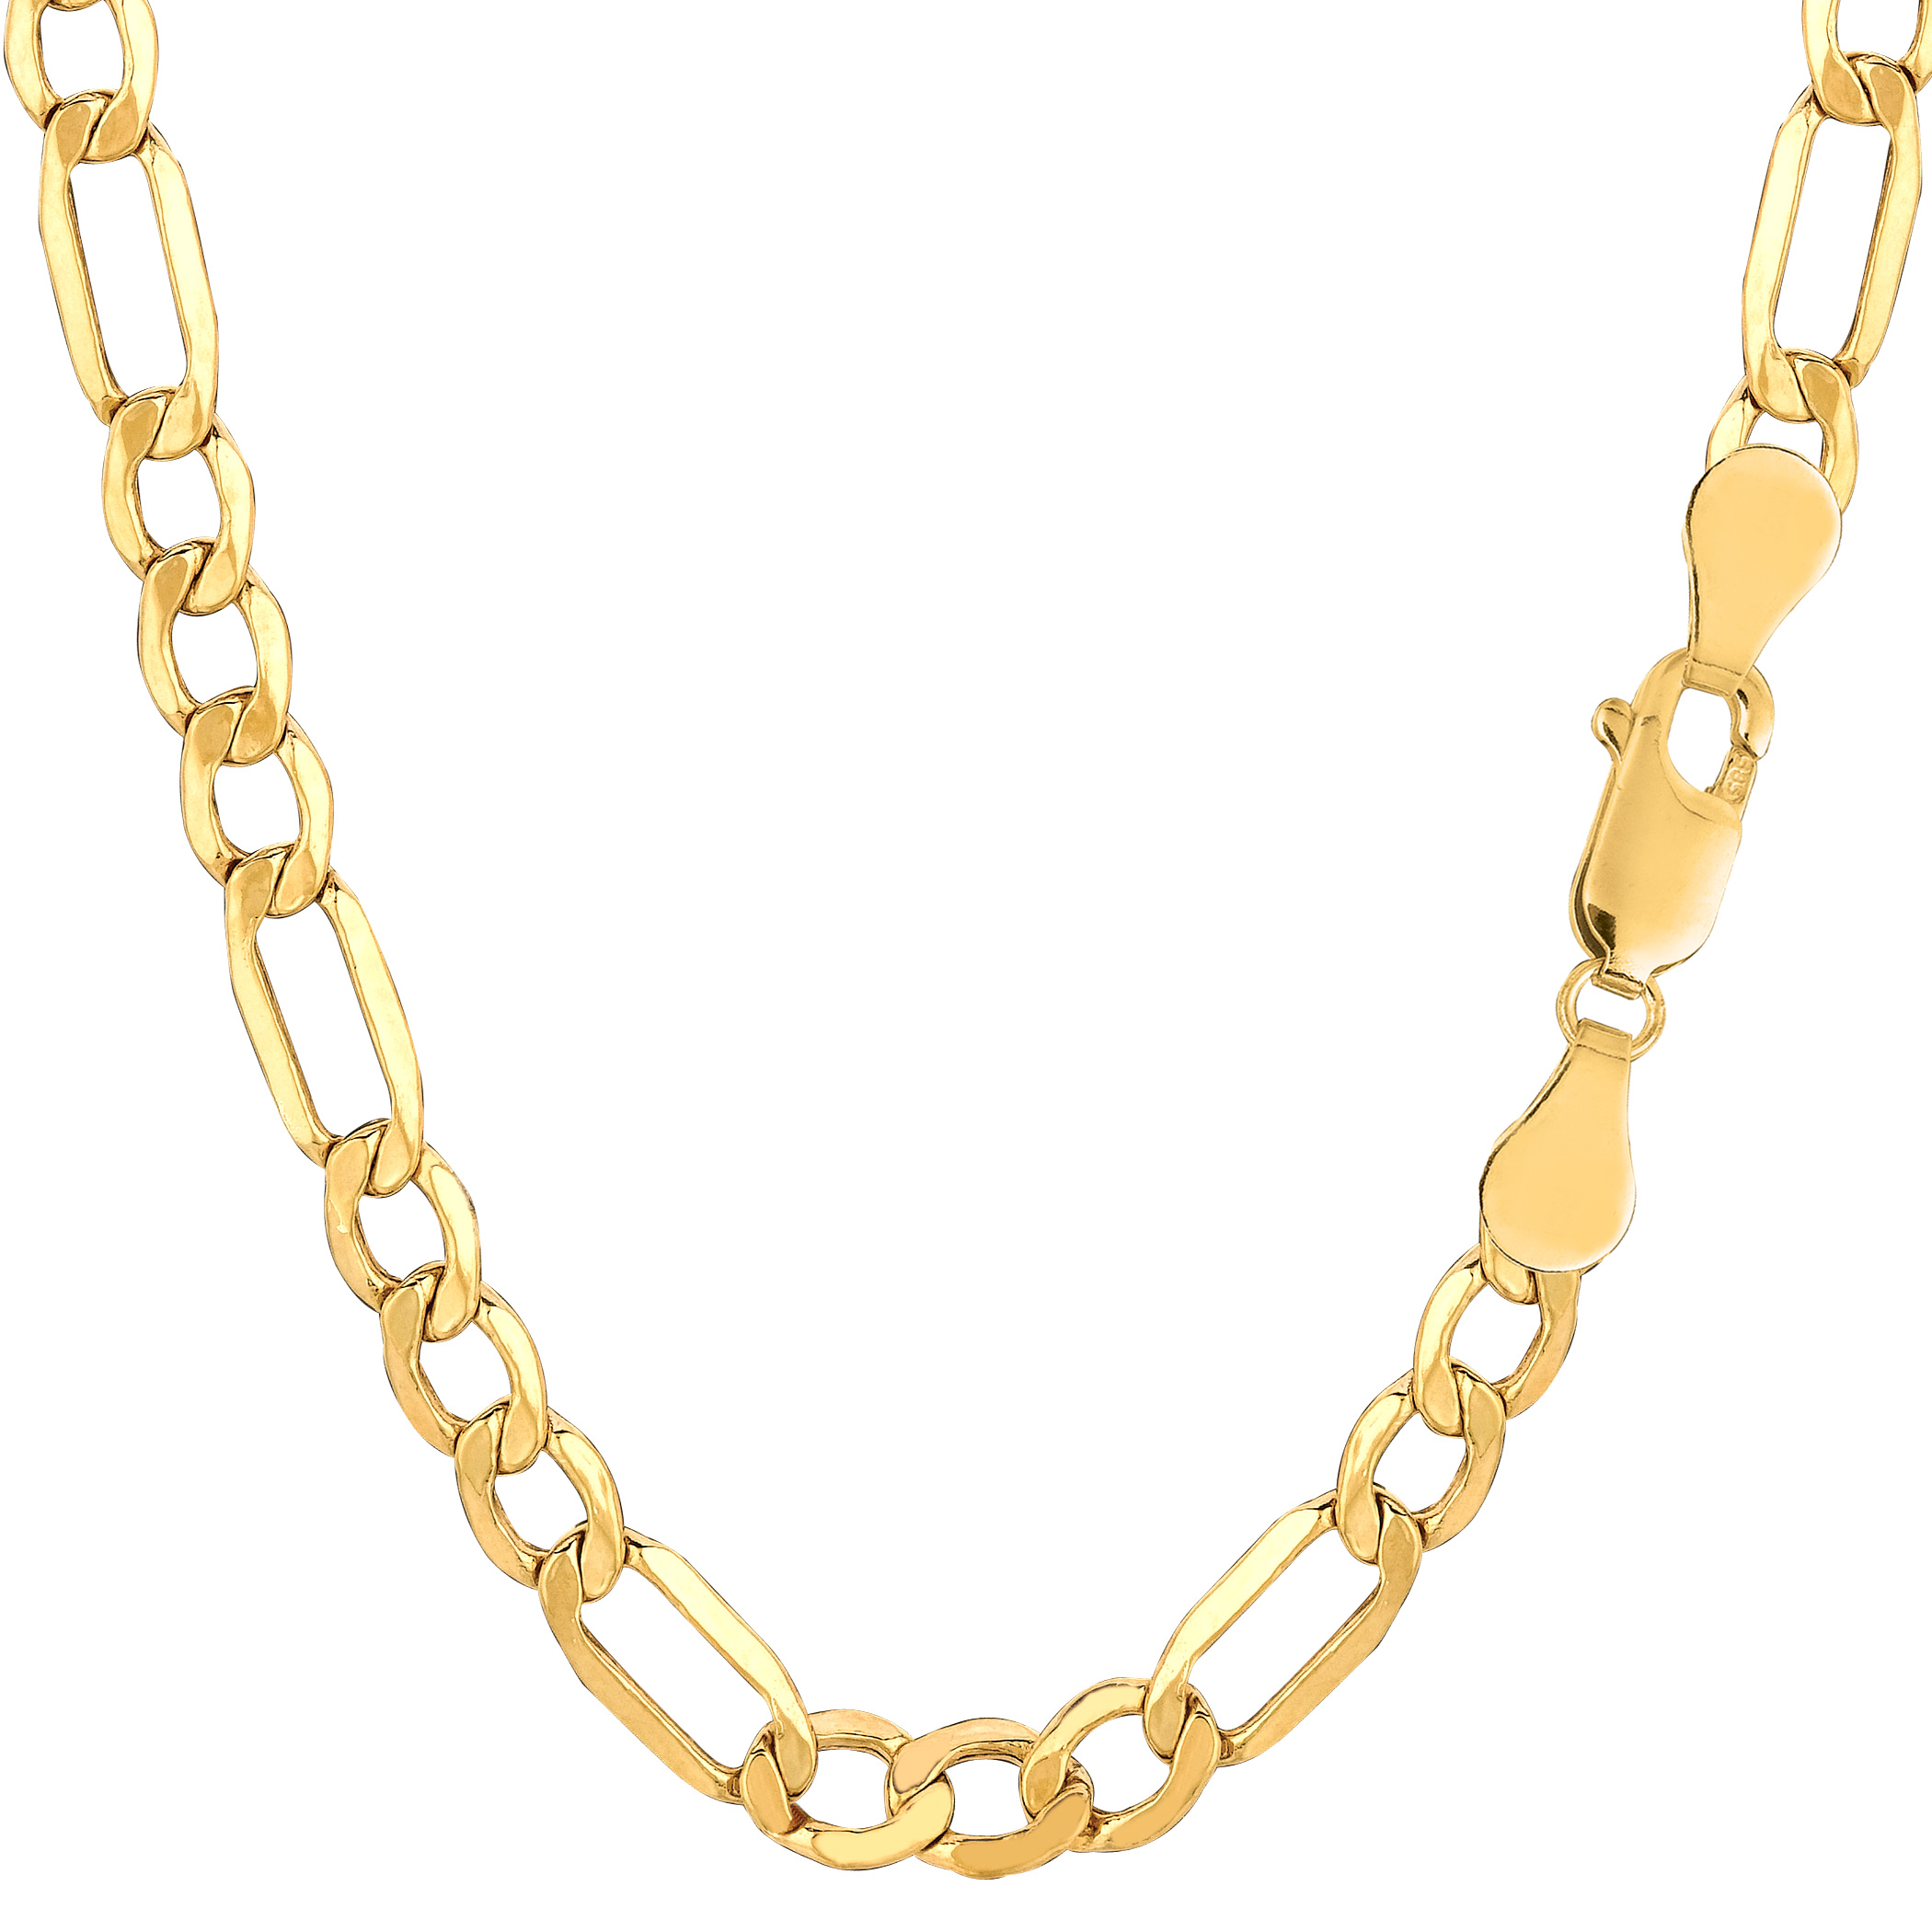 "10k Yellow Gold Hollow Figaro Bracelet Chain, 5.4mm, 8.5"" - image 1 de 1"